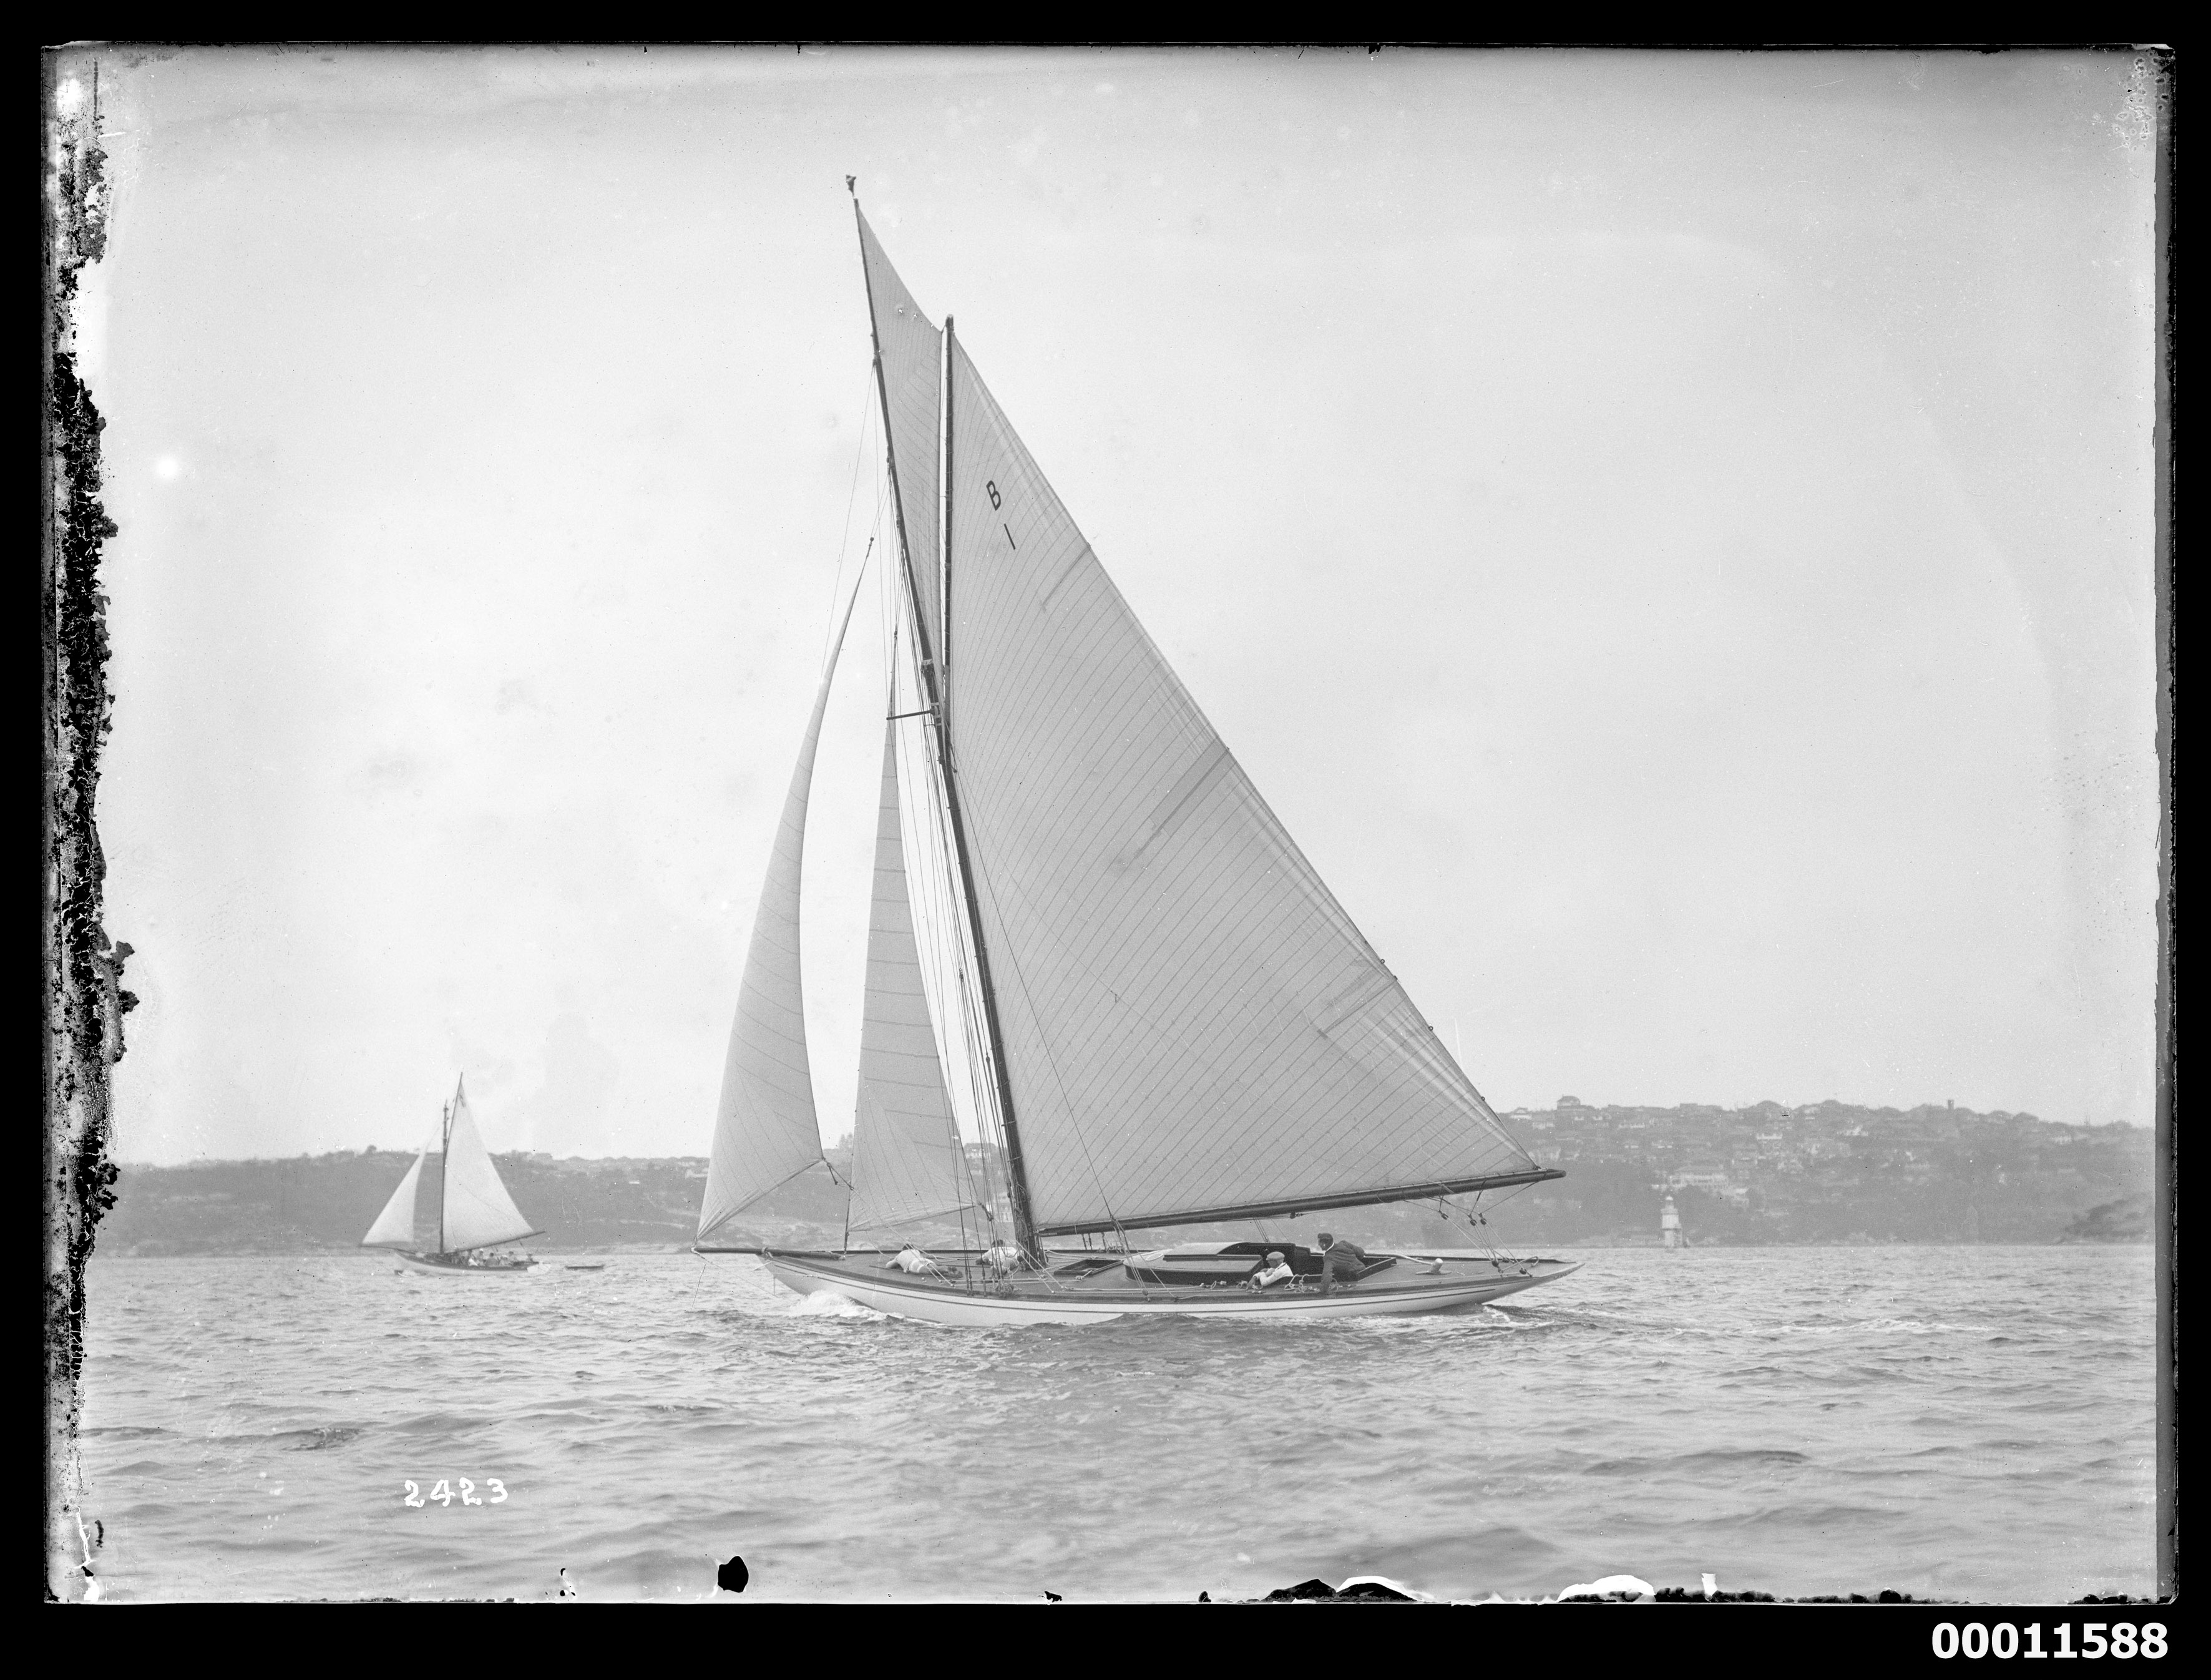 Victorian sloop EUN-NA-MARA on Sydney Harbour